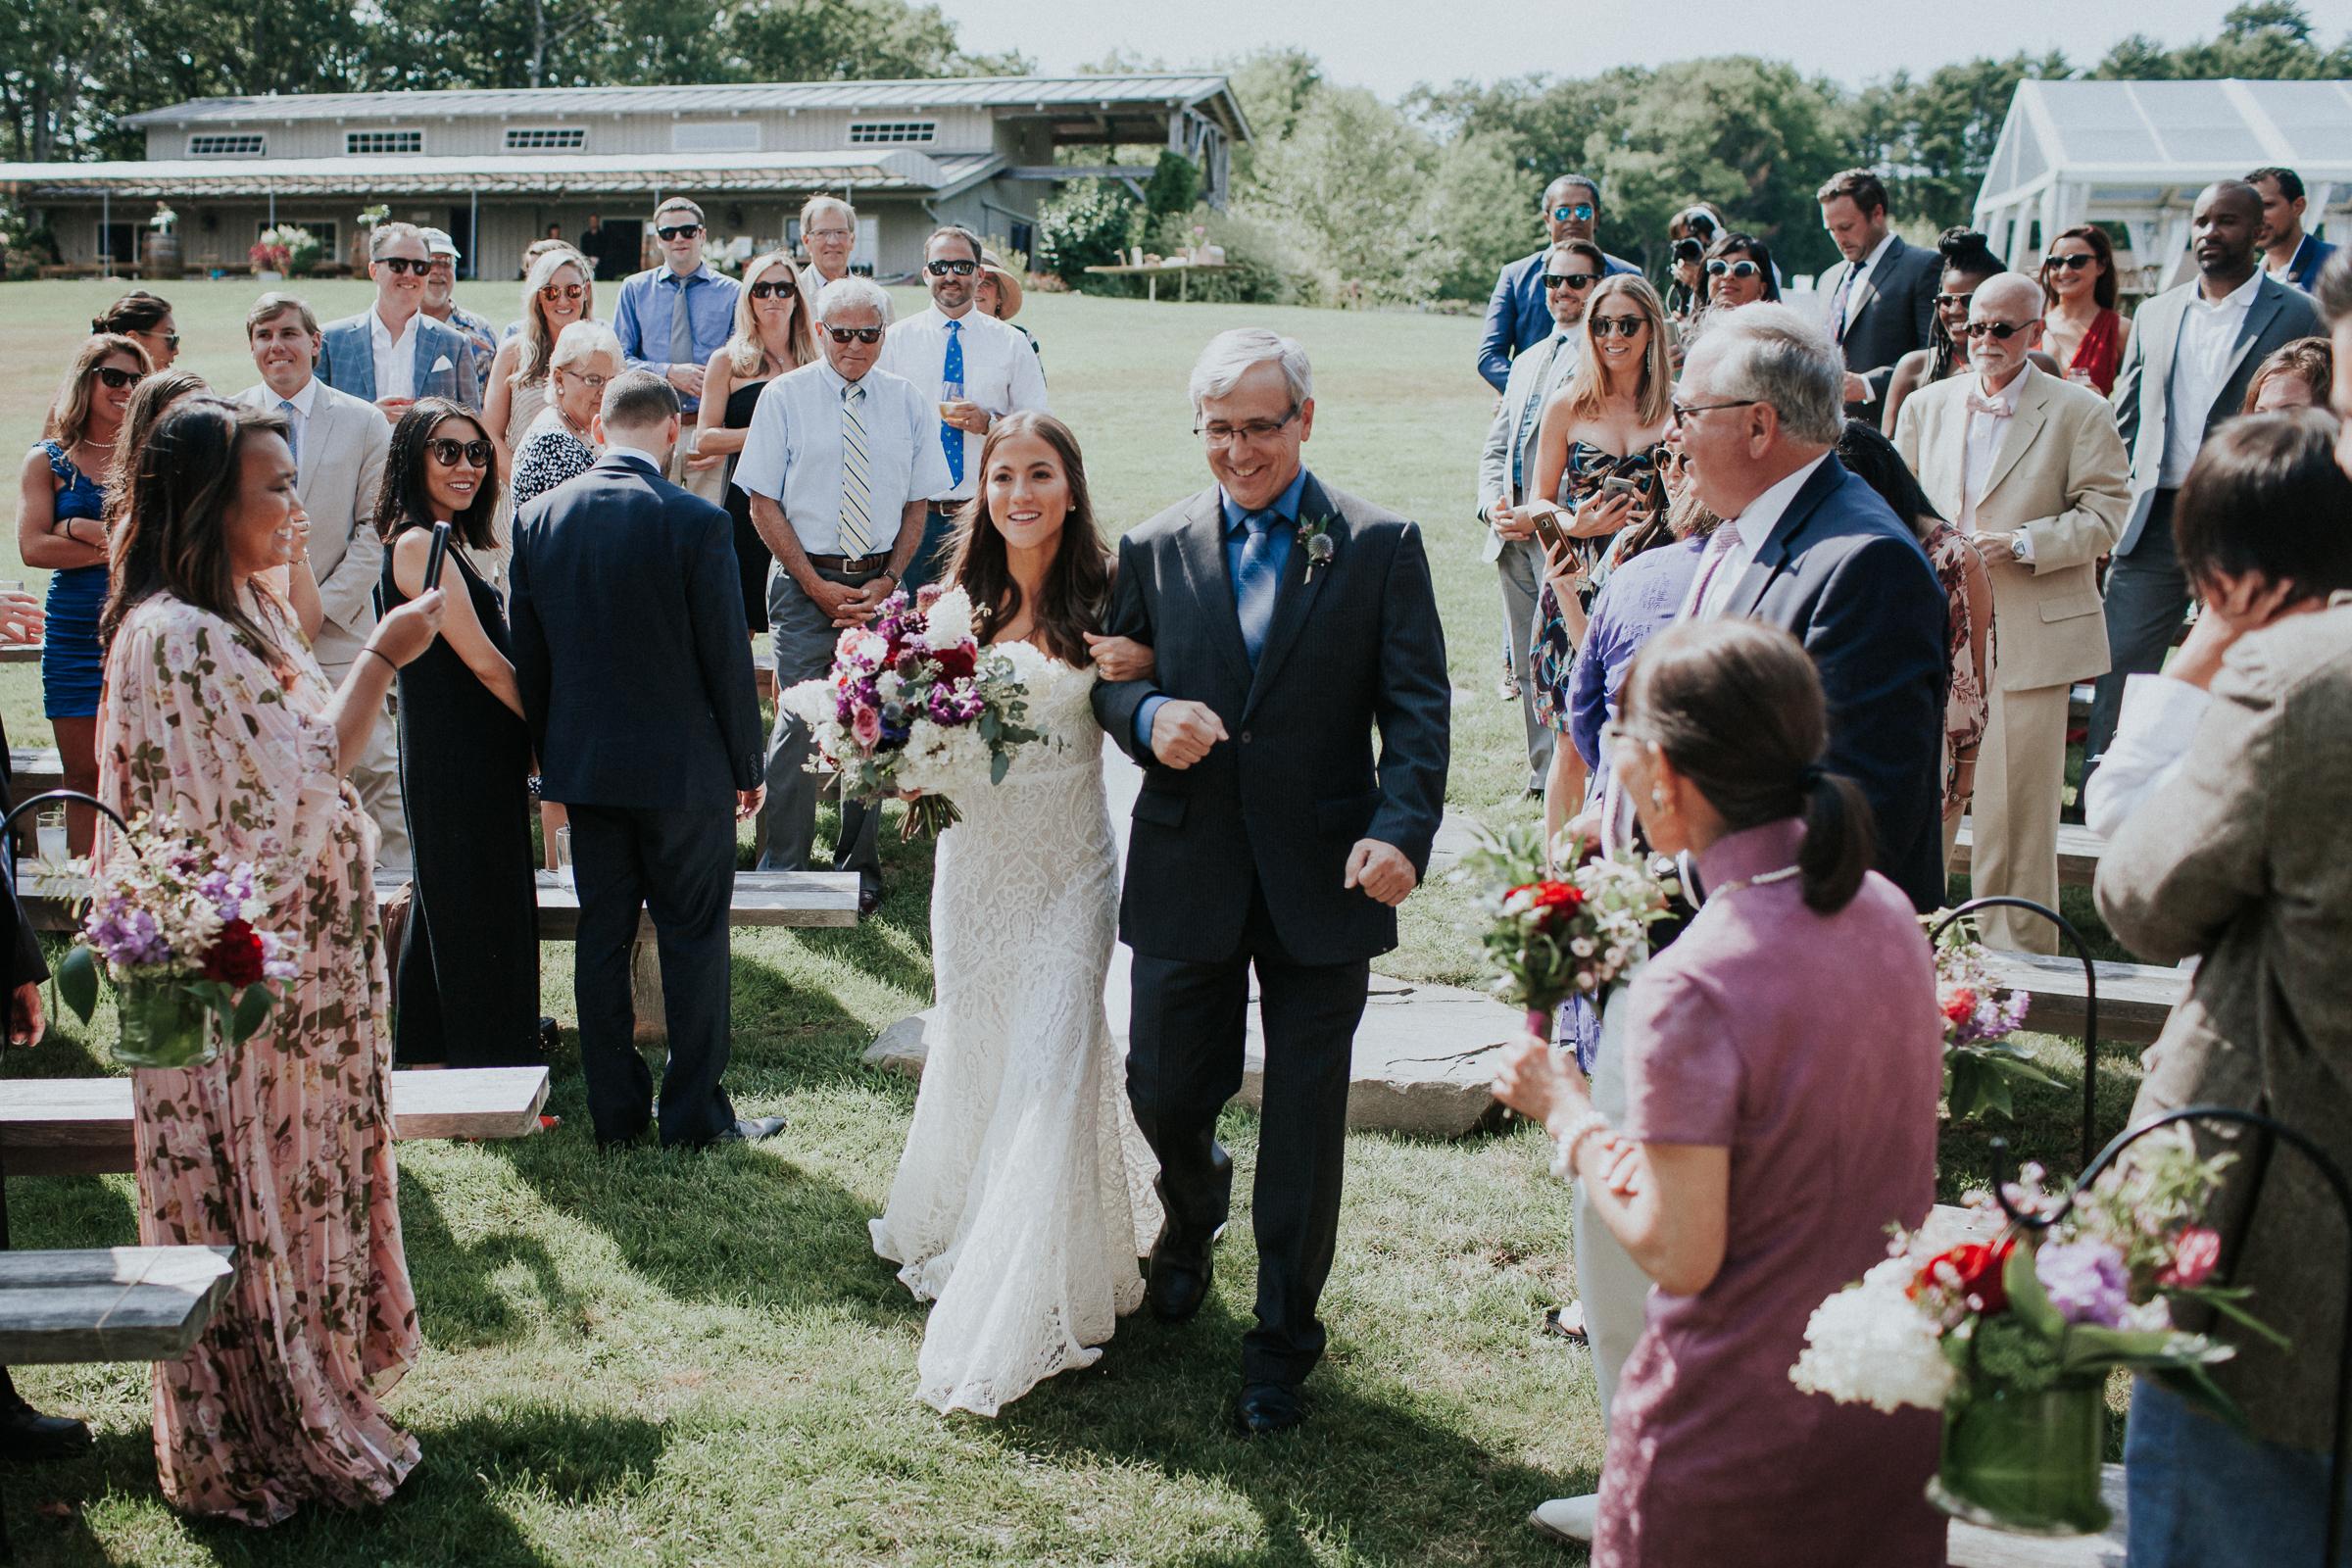 Marianmade-Farm-Wiscasset-Maine-Fine-Art-Documentary-Wedding-Photographer-Elvira-Kalviste-Photography-74.jpg